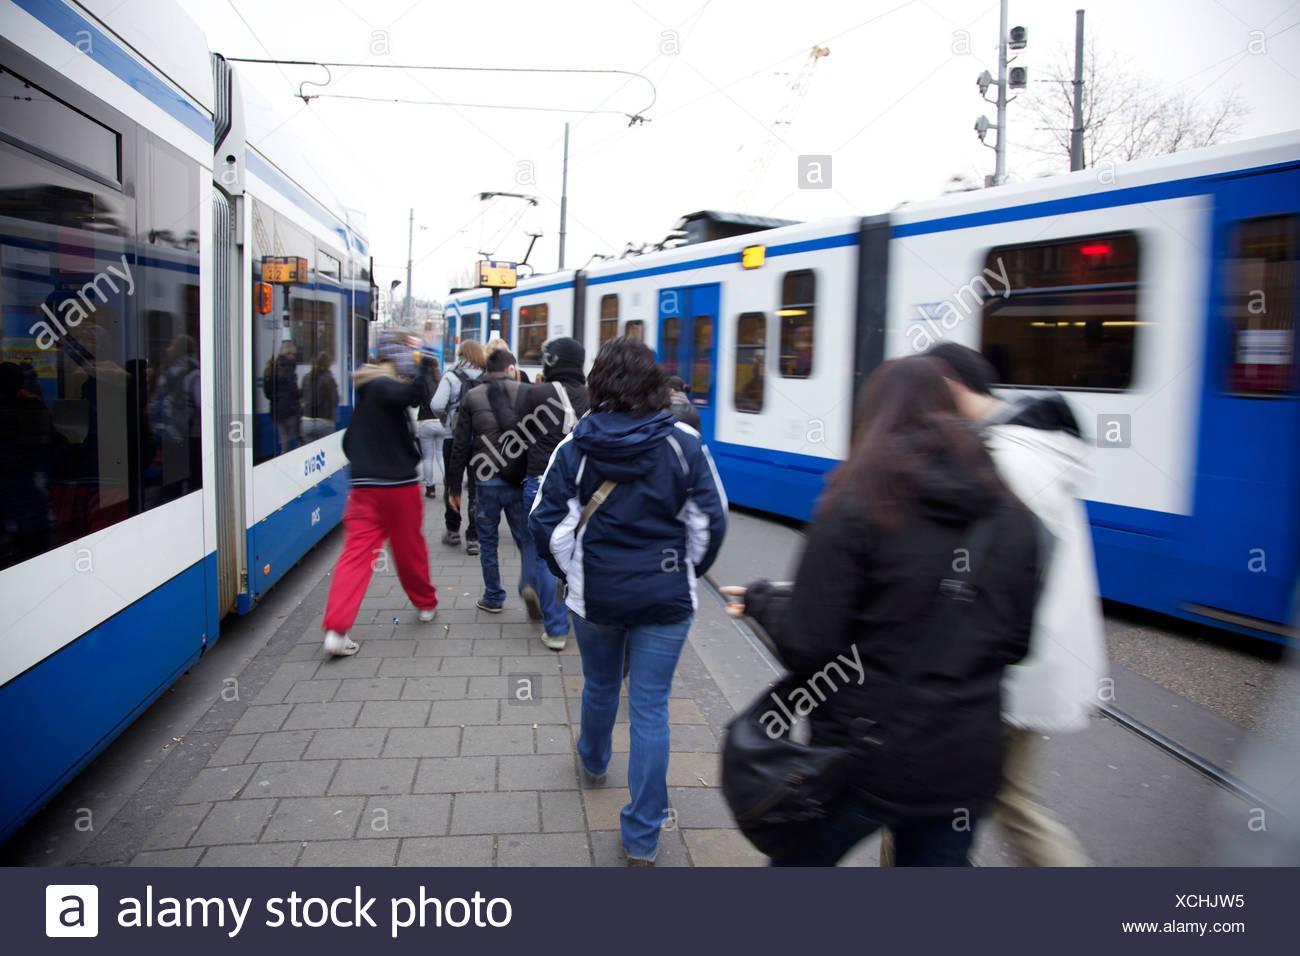 People walking between two streetcars. Amsterdam, Holland - Stock Image